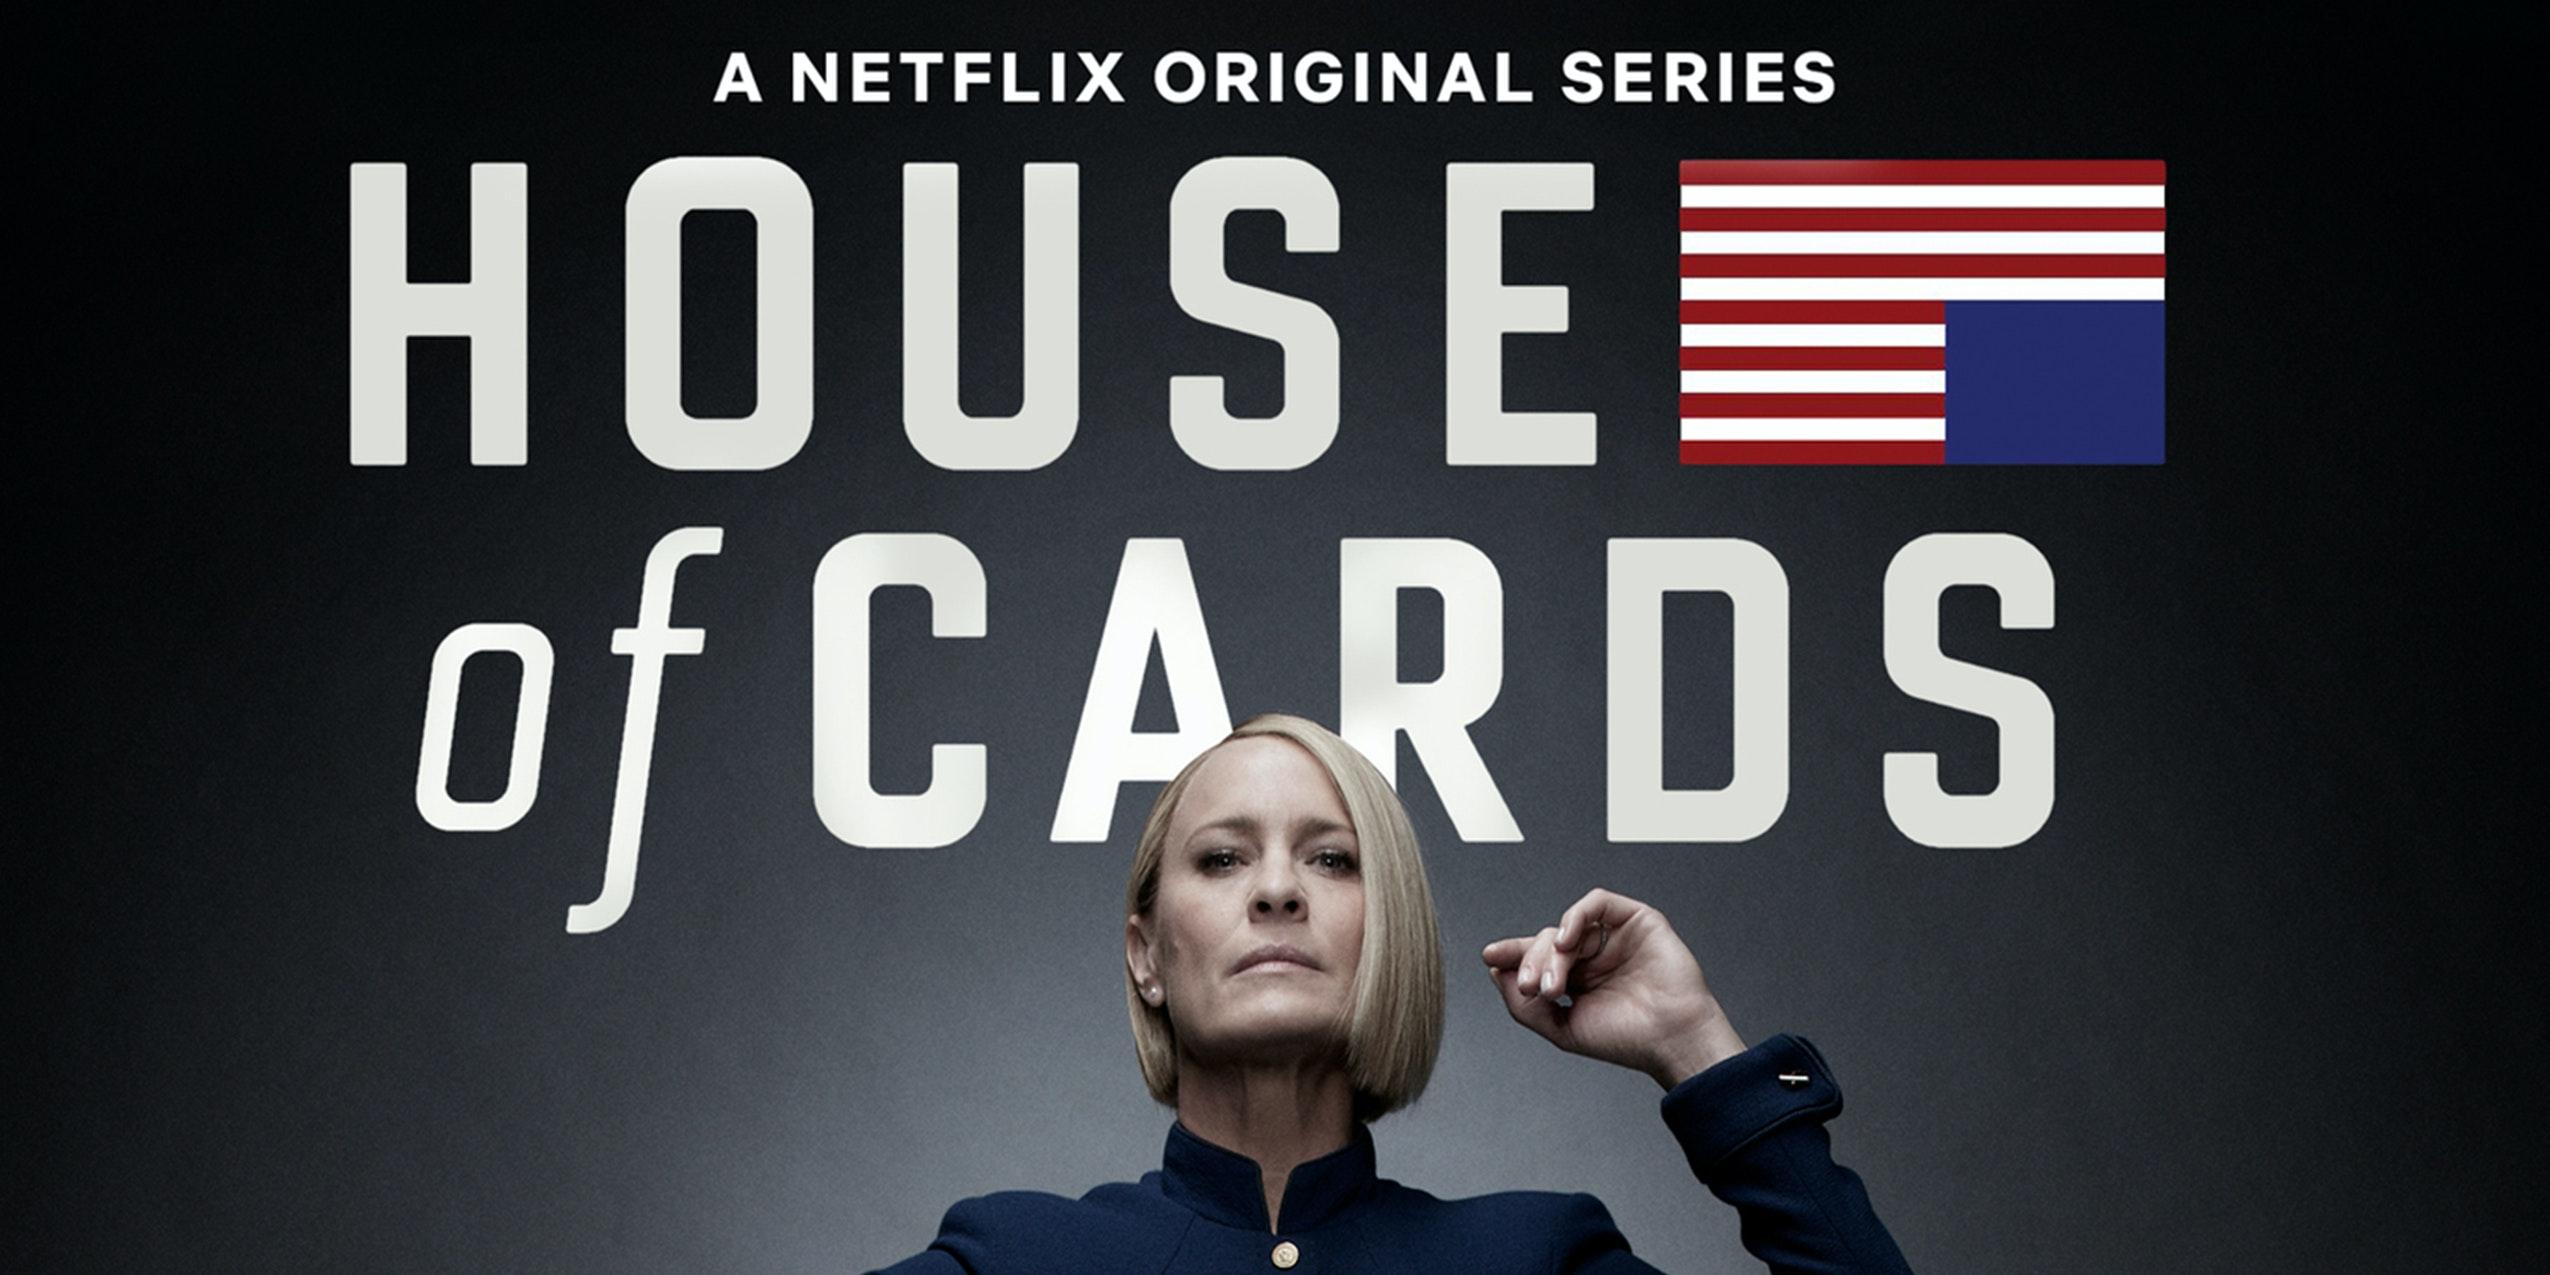 house of cards Netflix original series